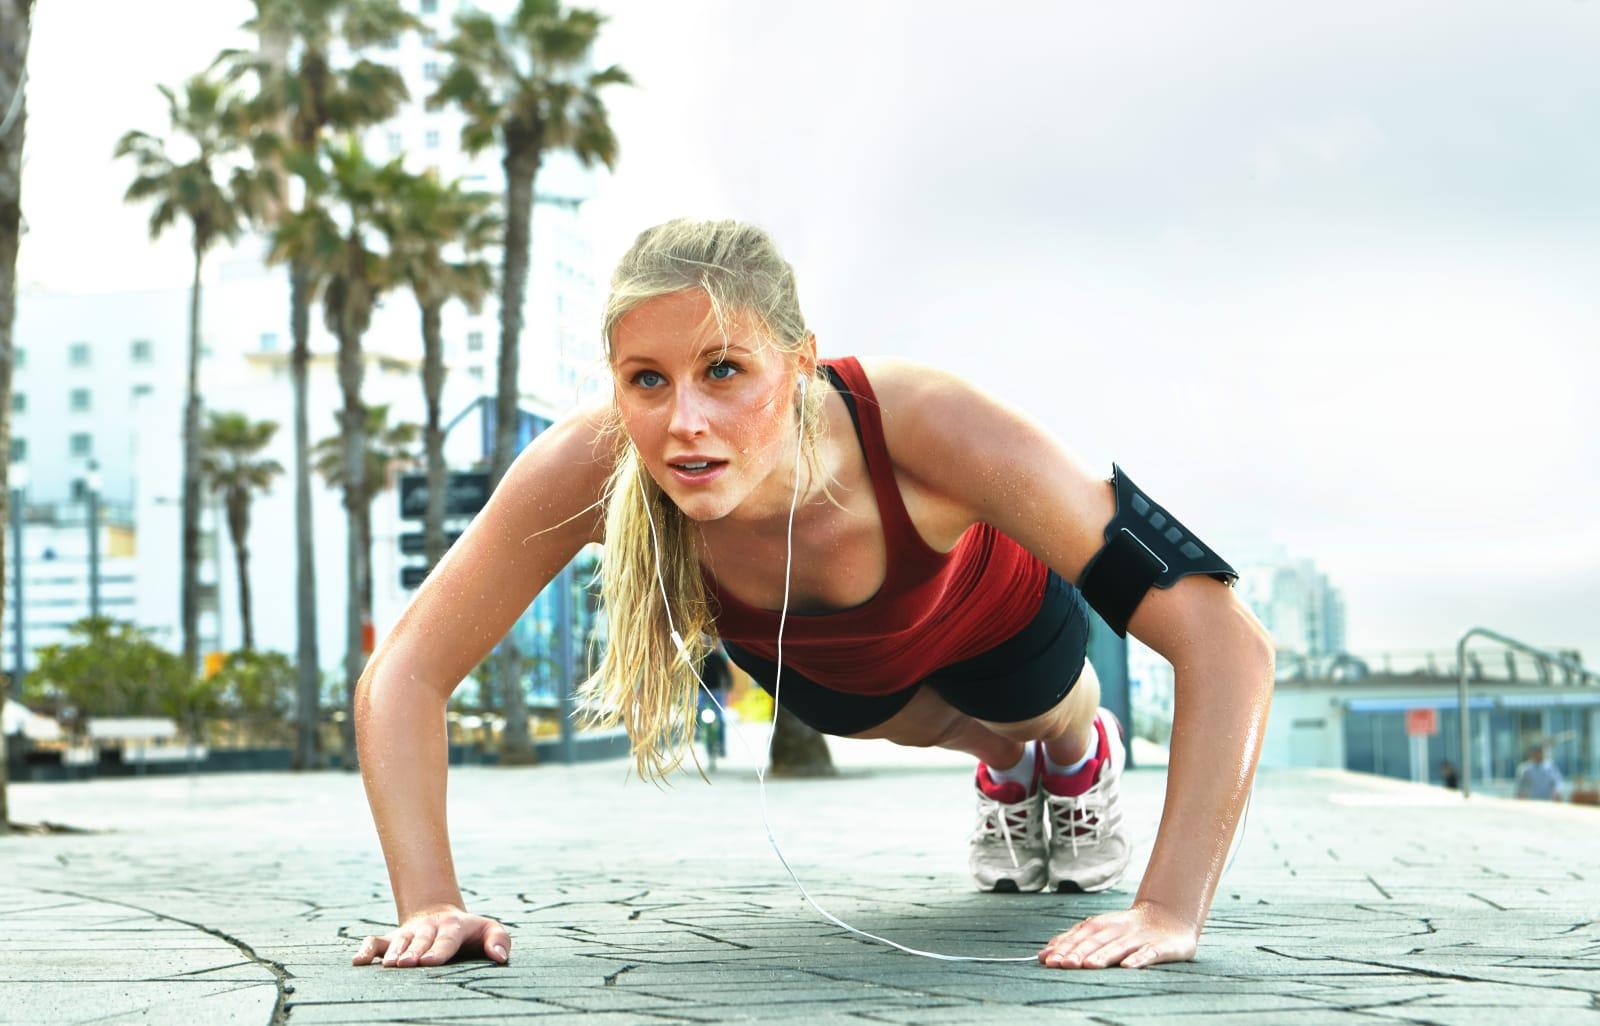 Wearable gauges fitness through stress hormones in your sweat